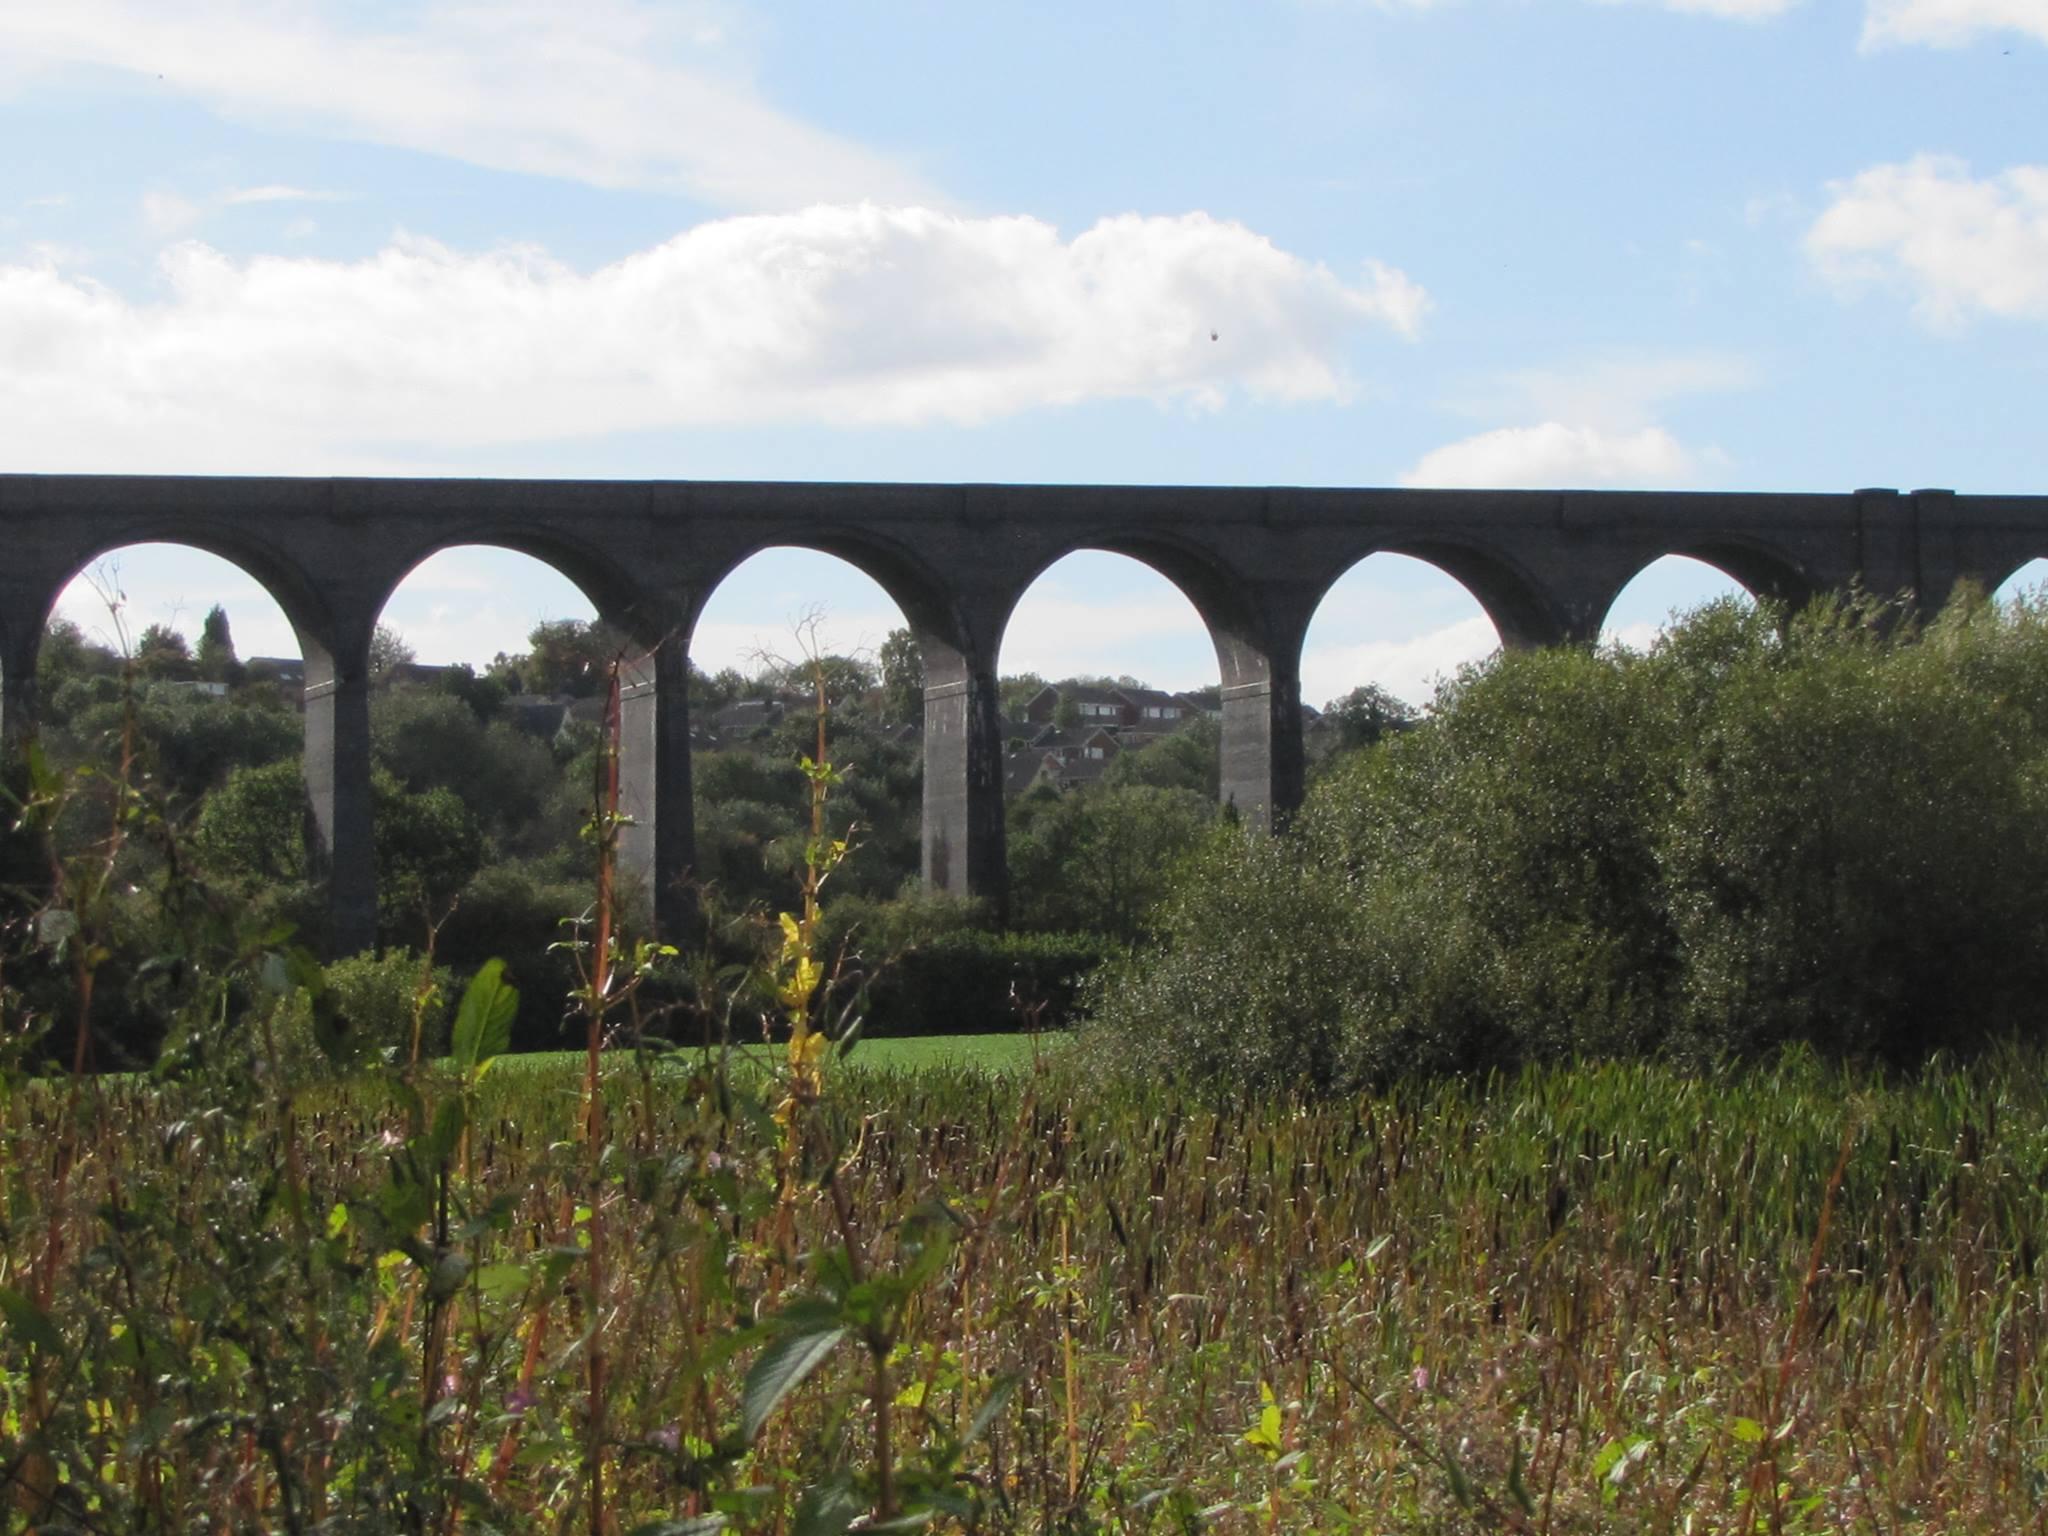 RDR viaduct